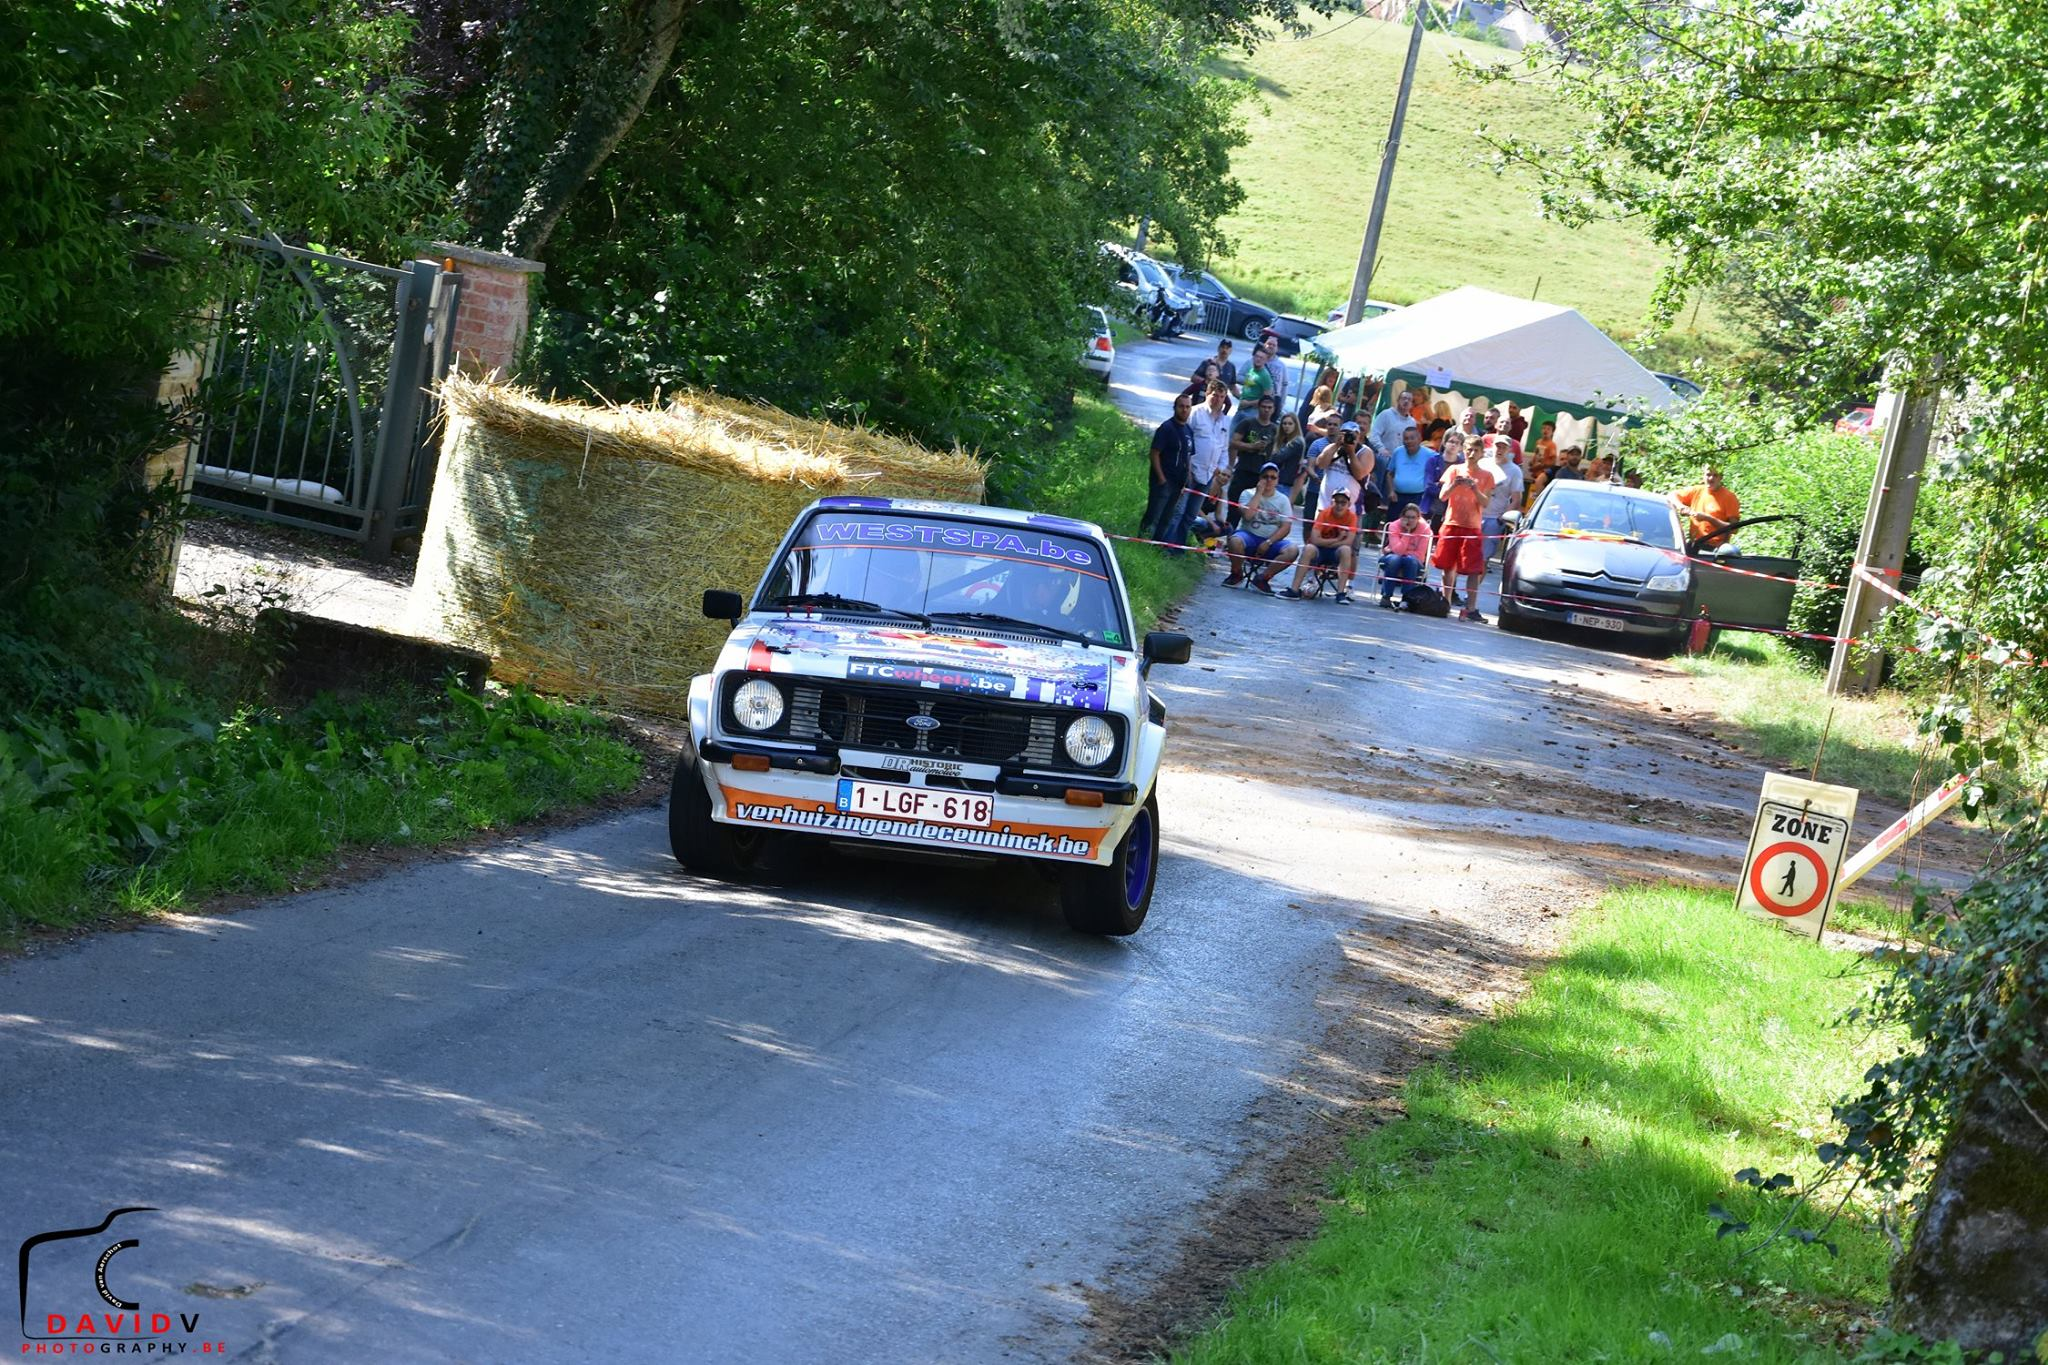 Oosterlinck Rallye-Sprint Solre Saint-Géry 2017